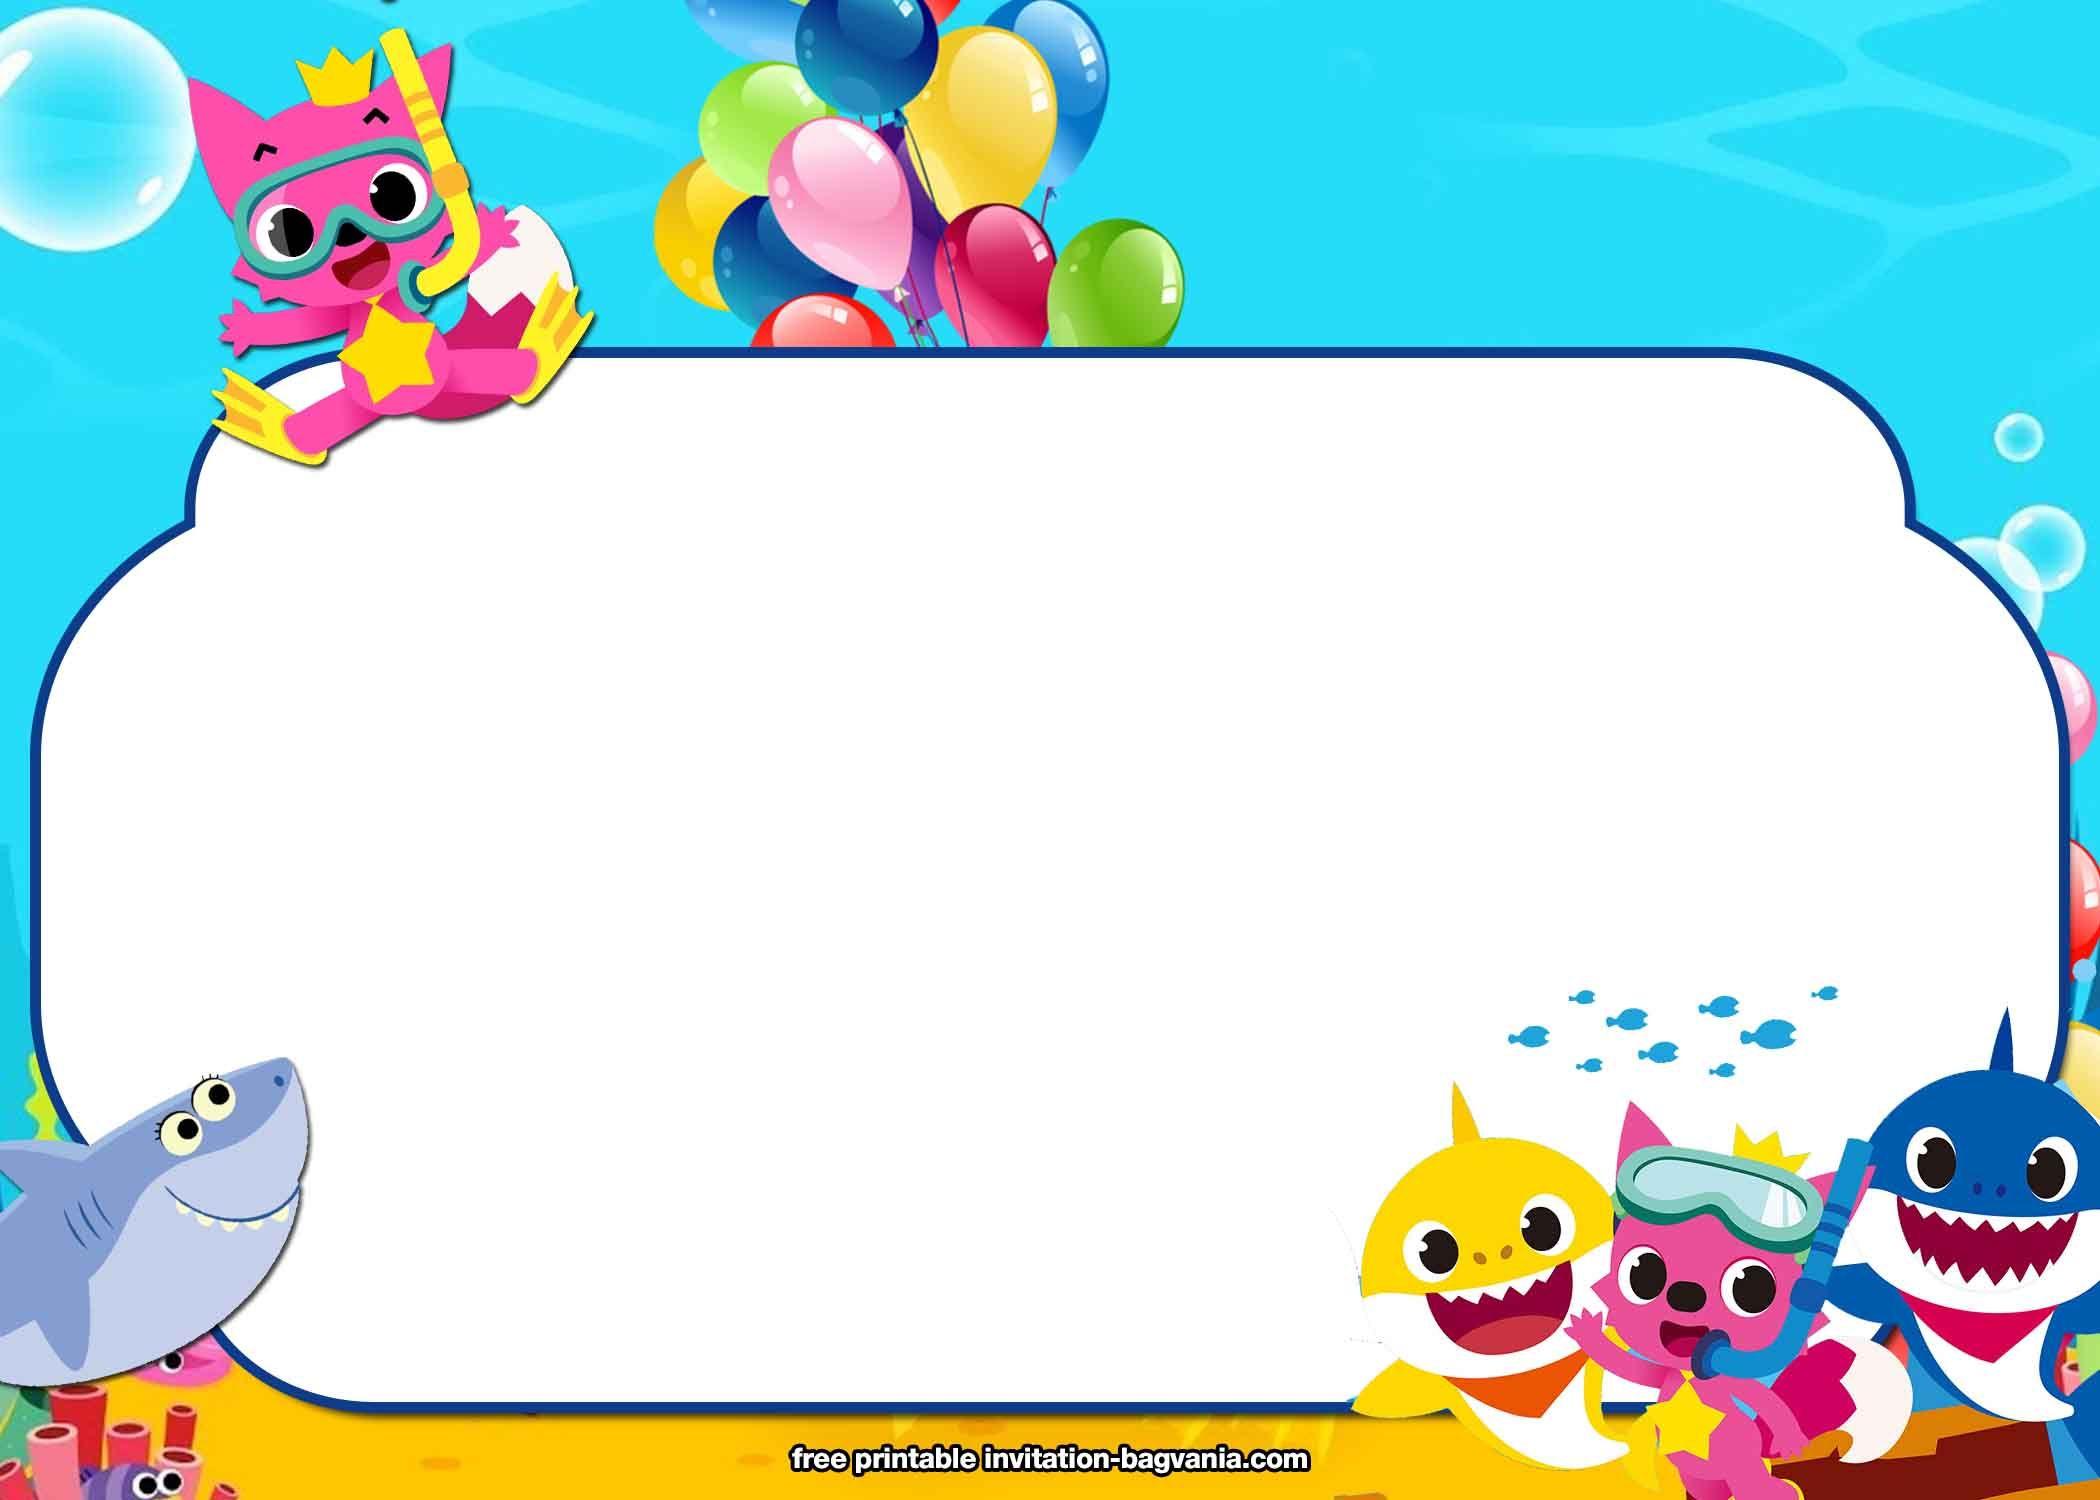 Free Printable Baby Shark Birthday Invitation Templates Shark Birthday Invitations Shark Themed Birthday Party Shark Birthday Party Invitation